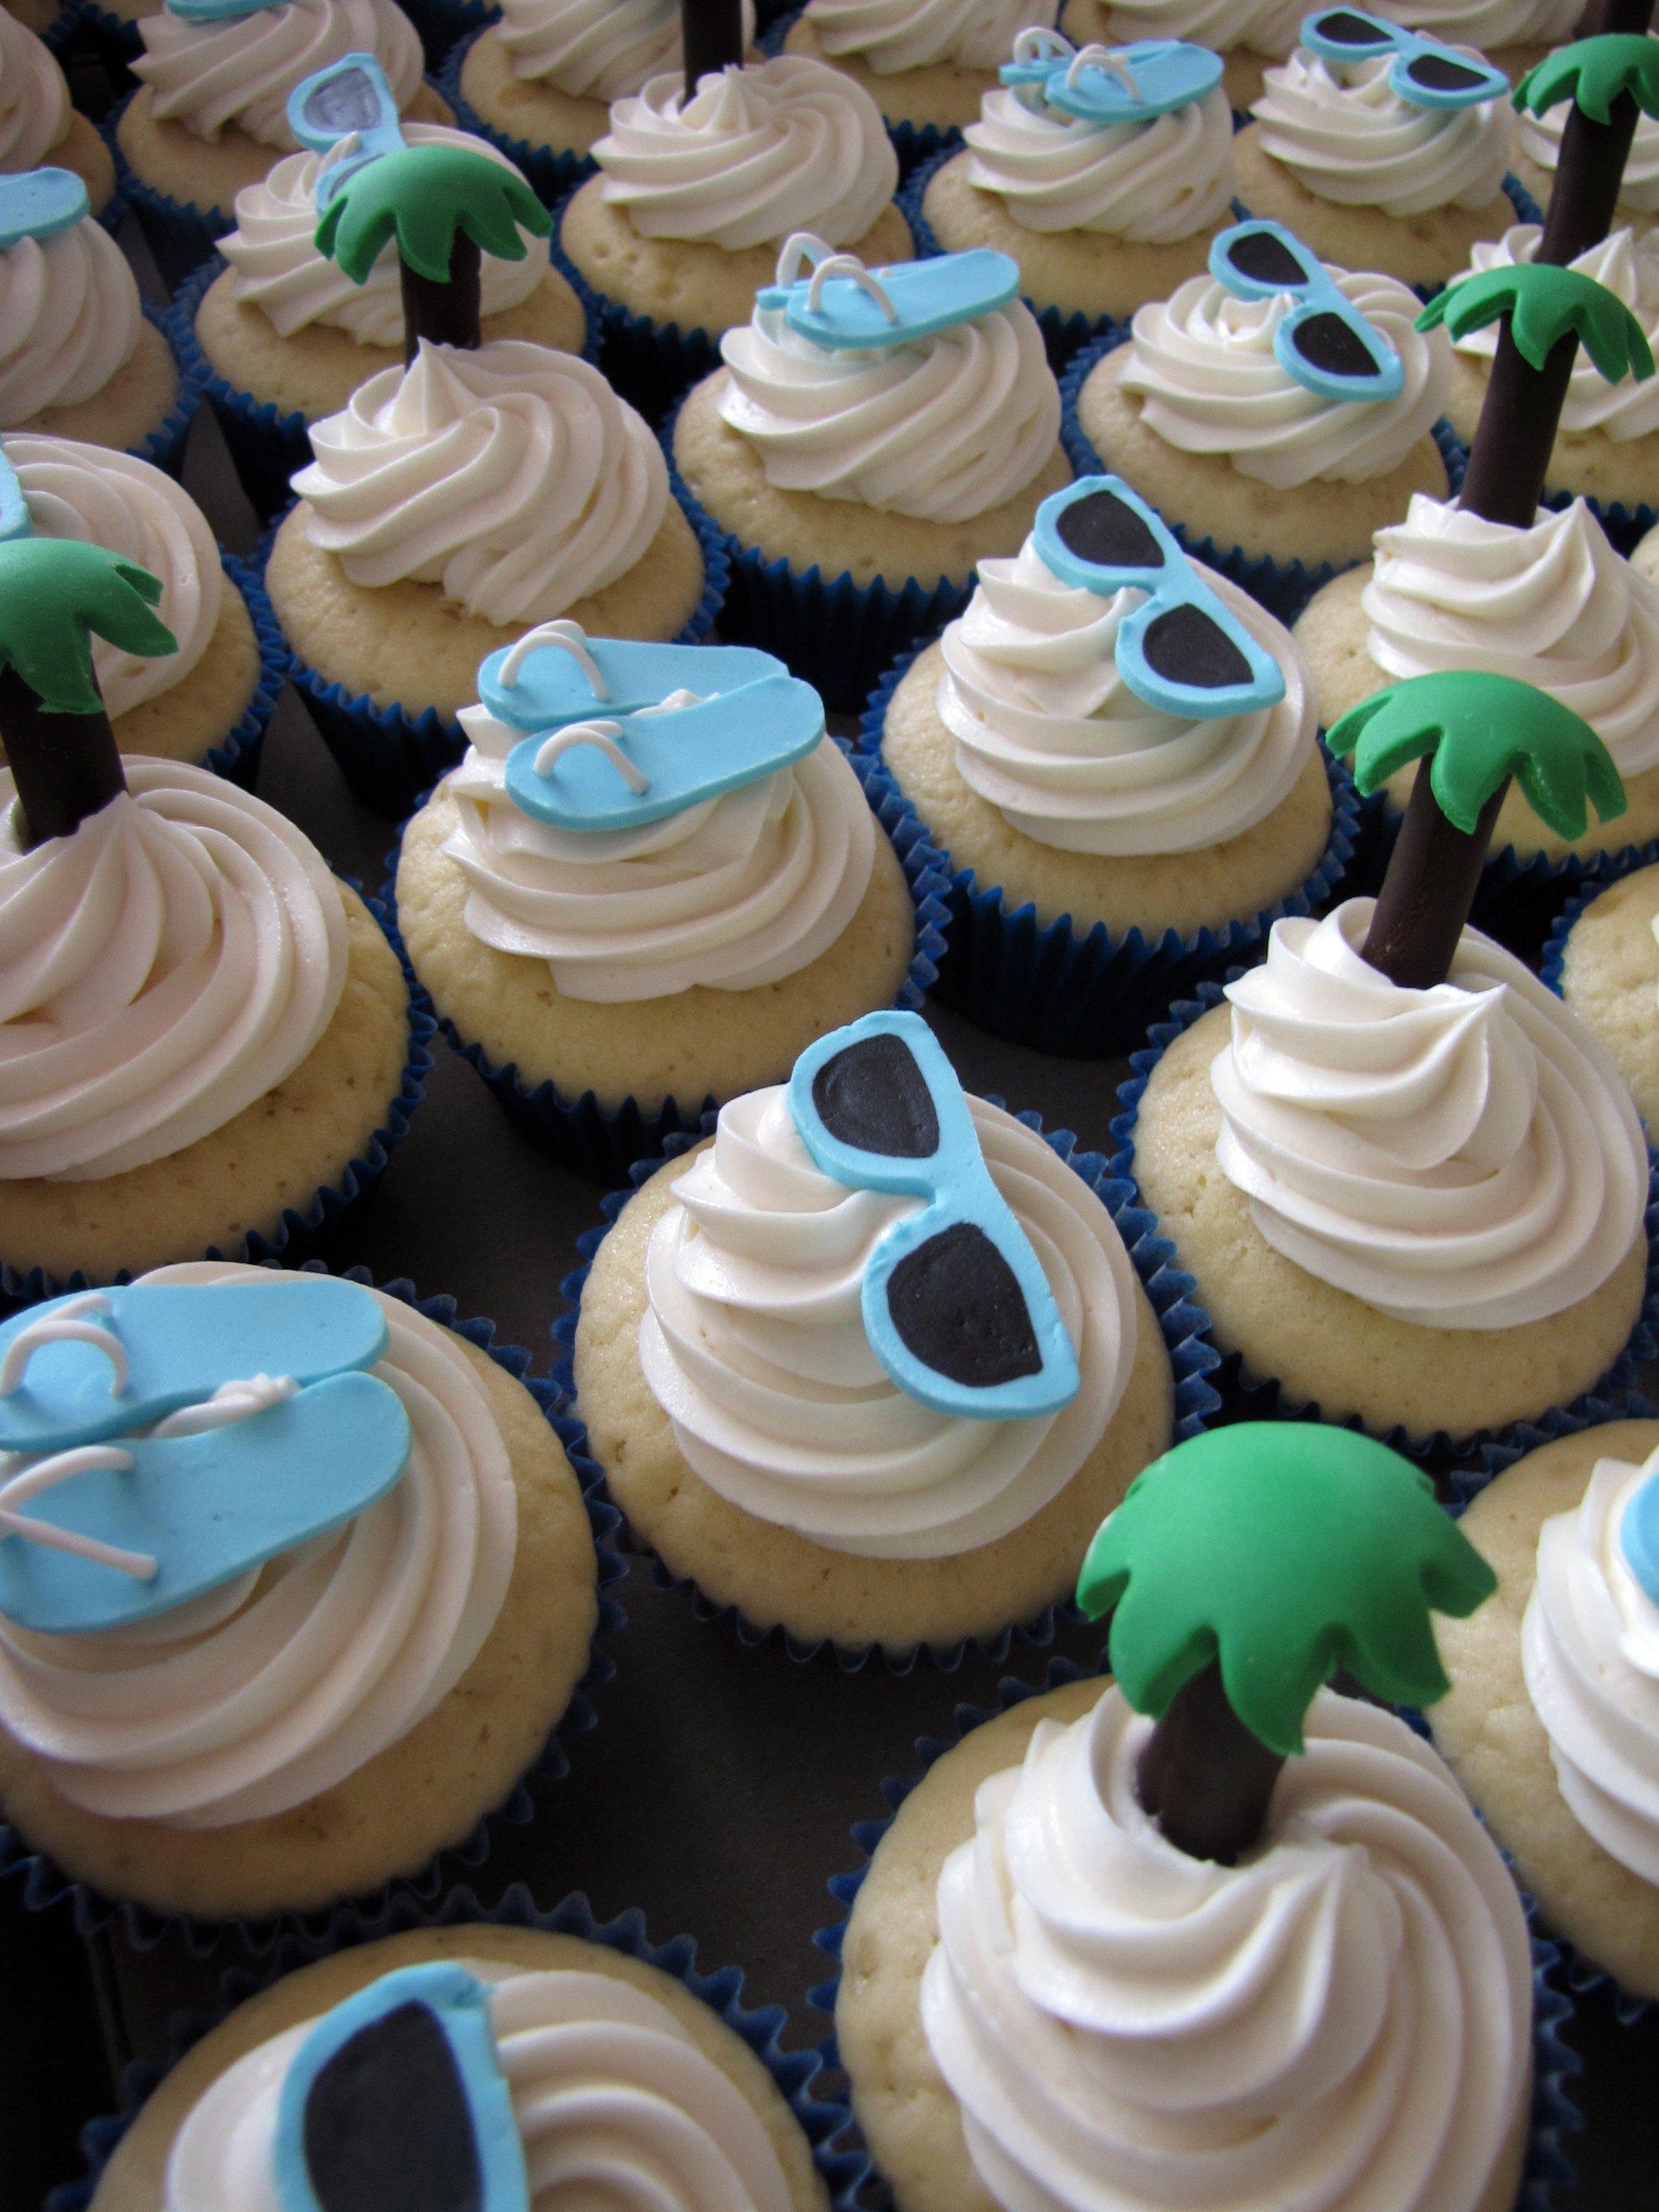 filebeach themed bridal shower cupcakes 4701417256jpg